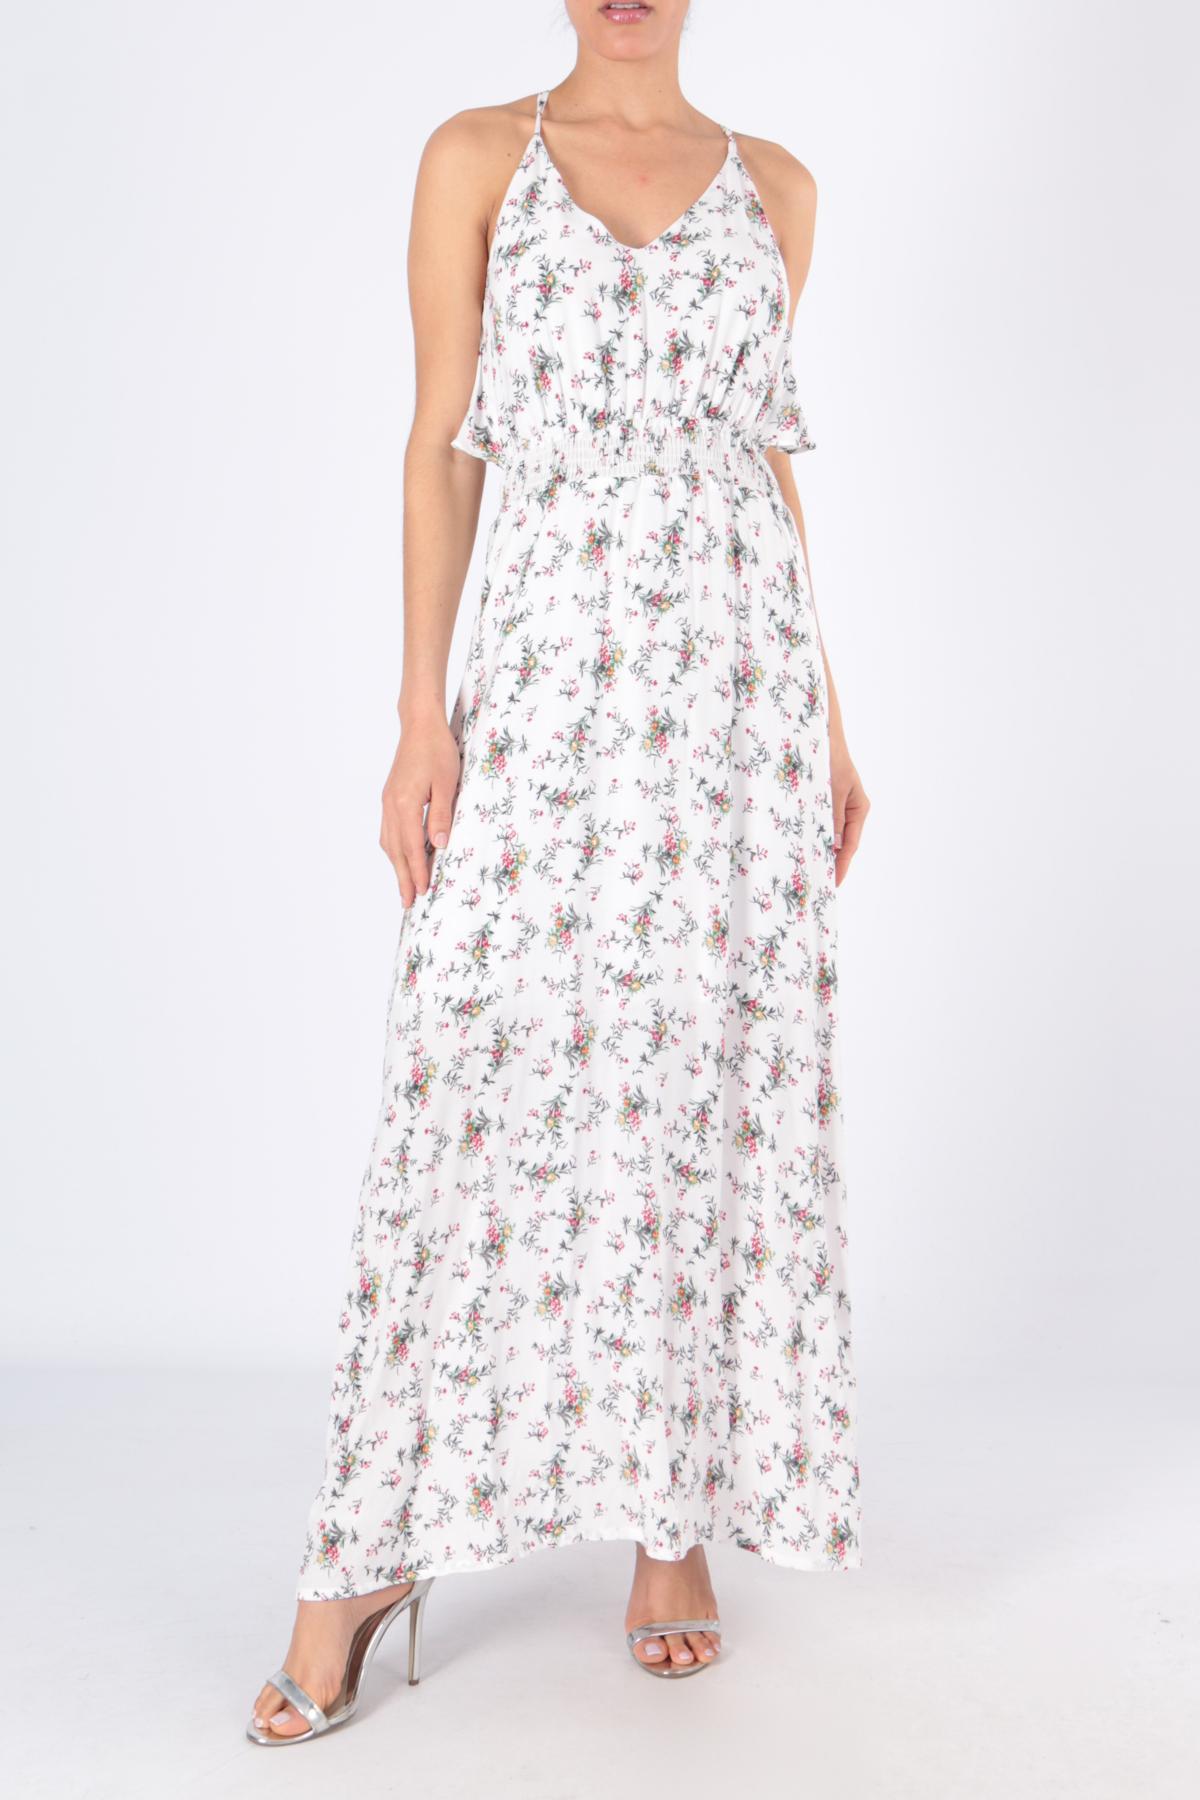 Robes longues Femme JR8101-BLANC JOWELL